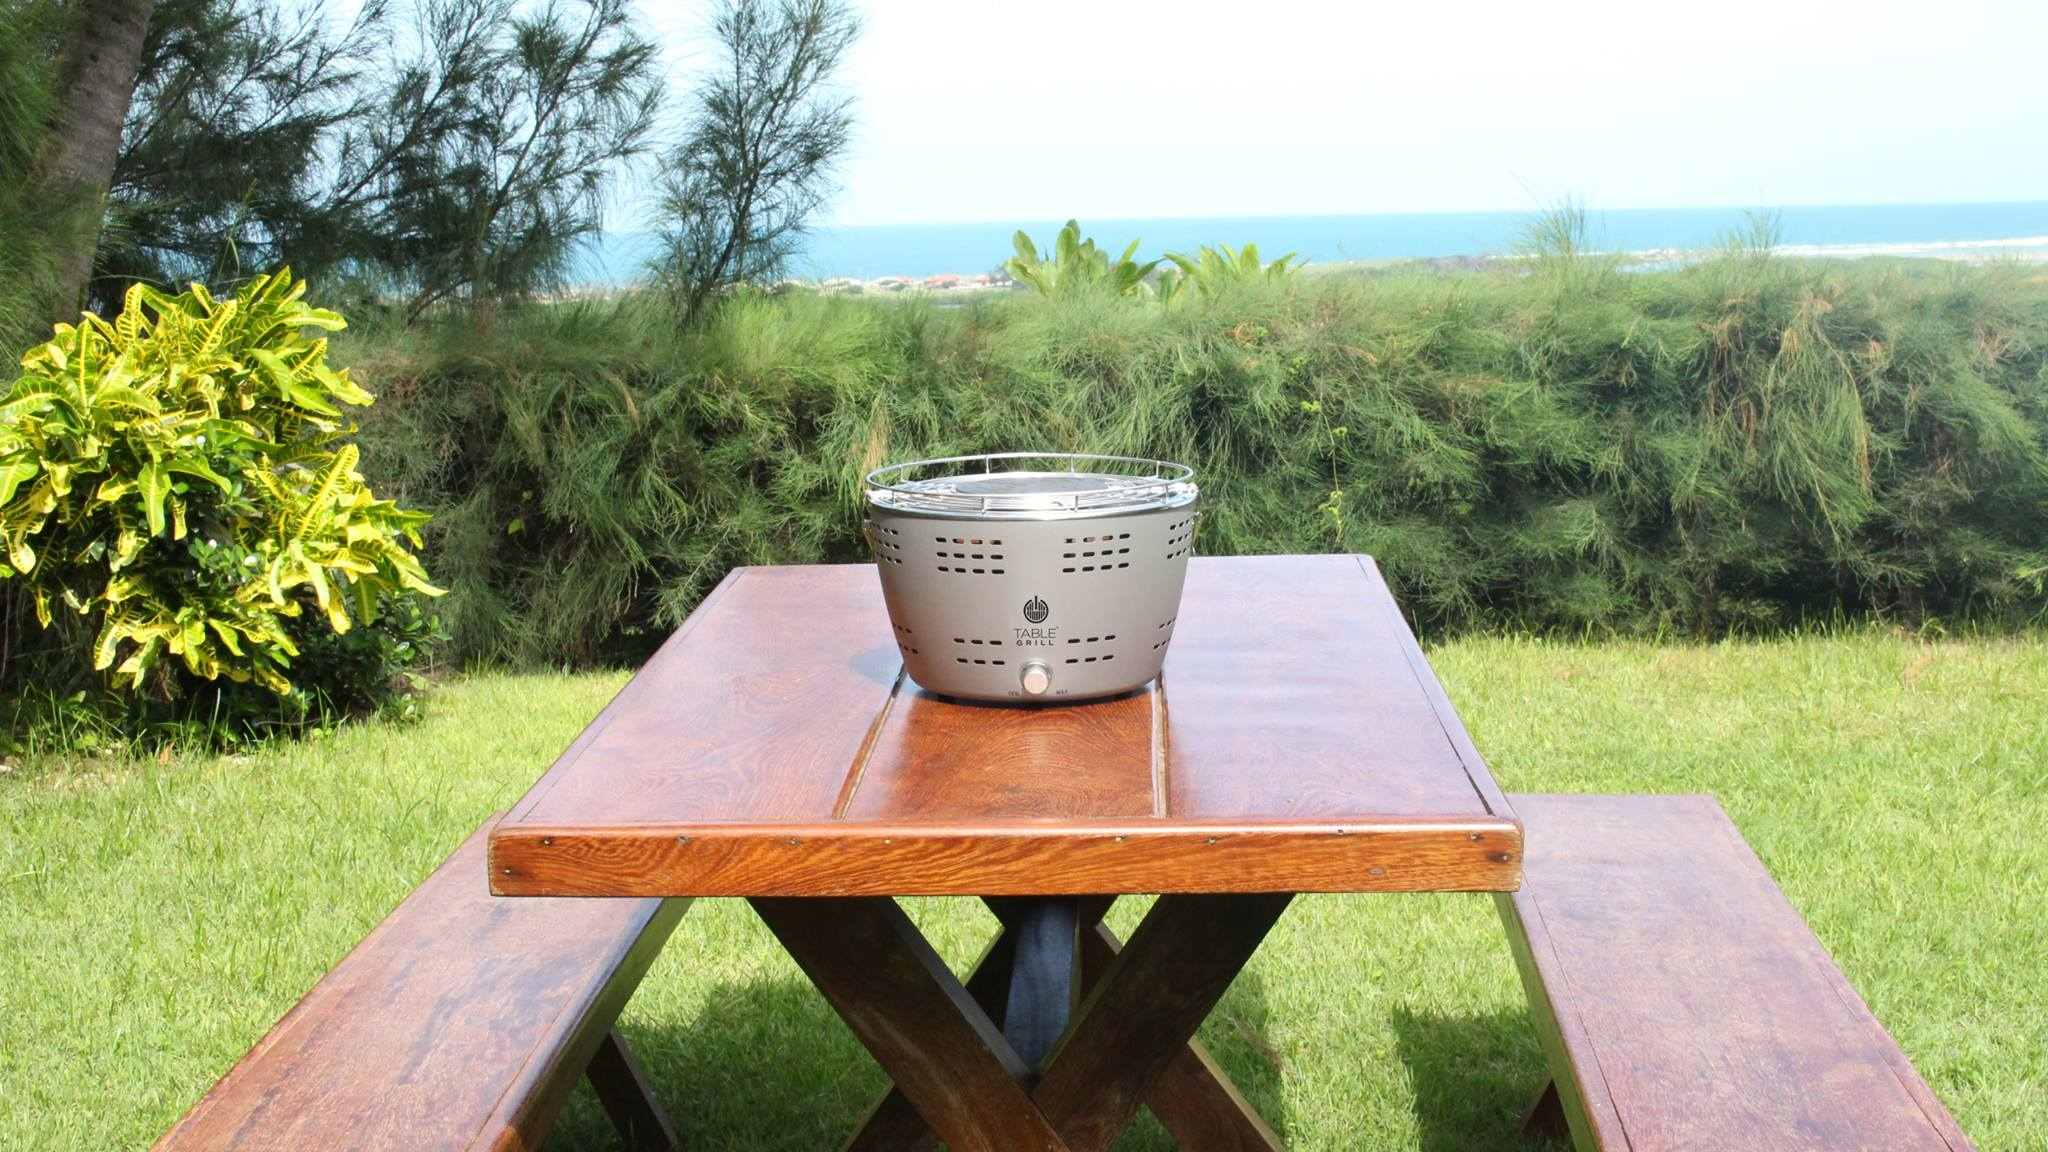 Churrasqueira de mesa Table Grill vale a pena? (Foto: Reprodução/Facebook/Table Grill)